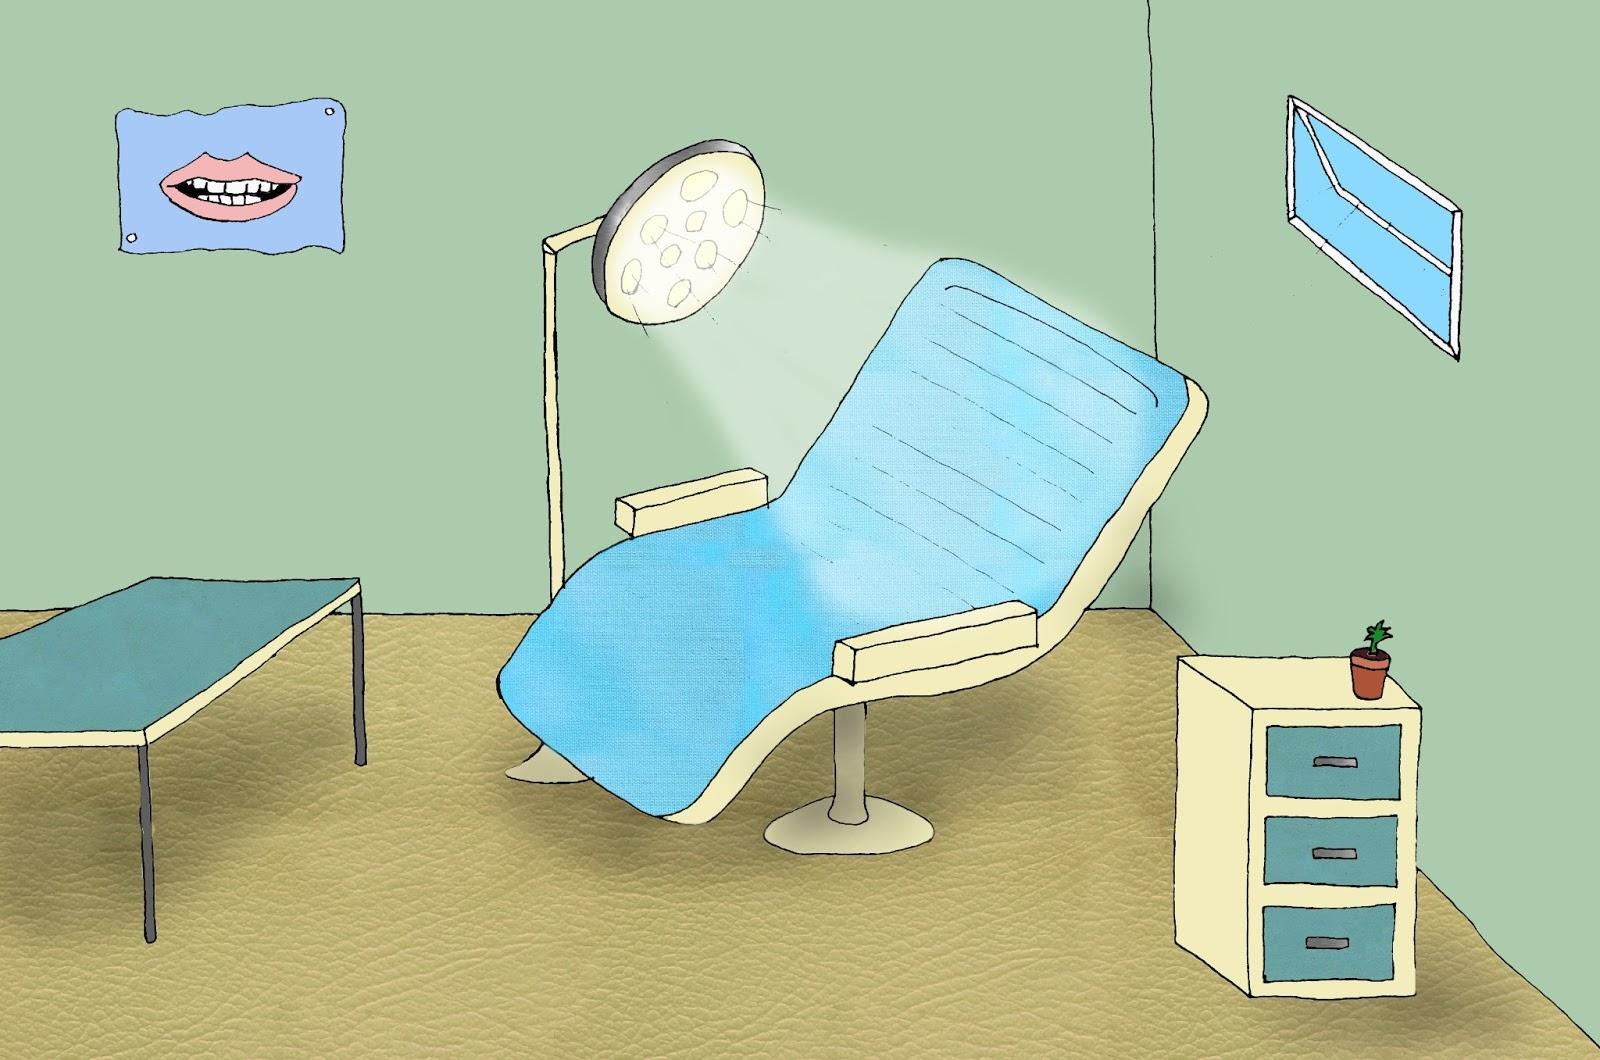 Room clipart hospital room #14